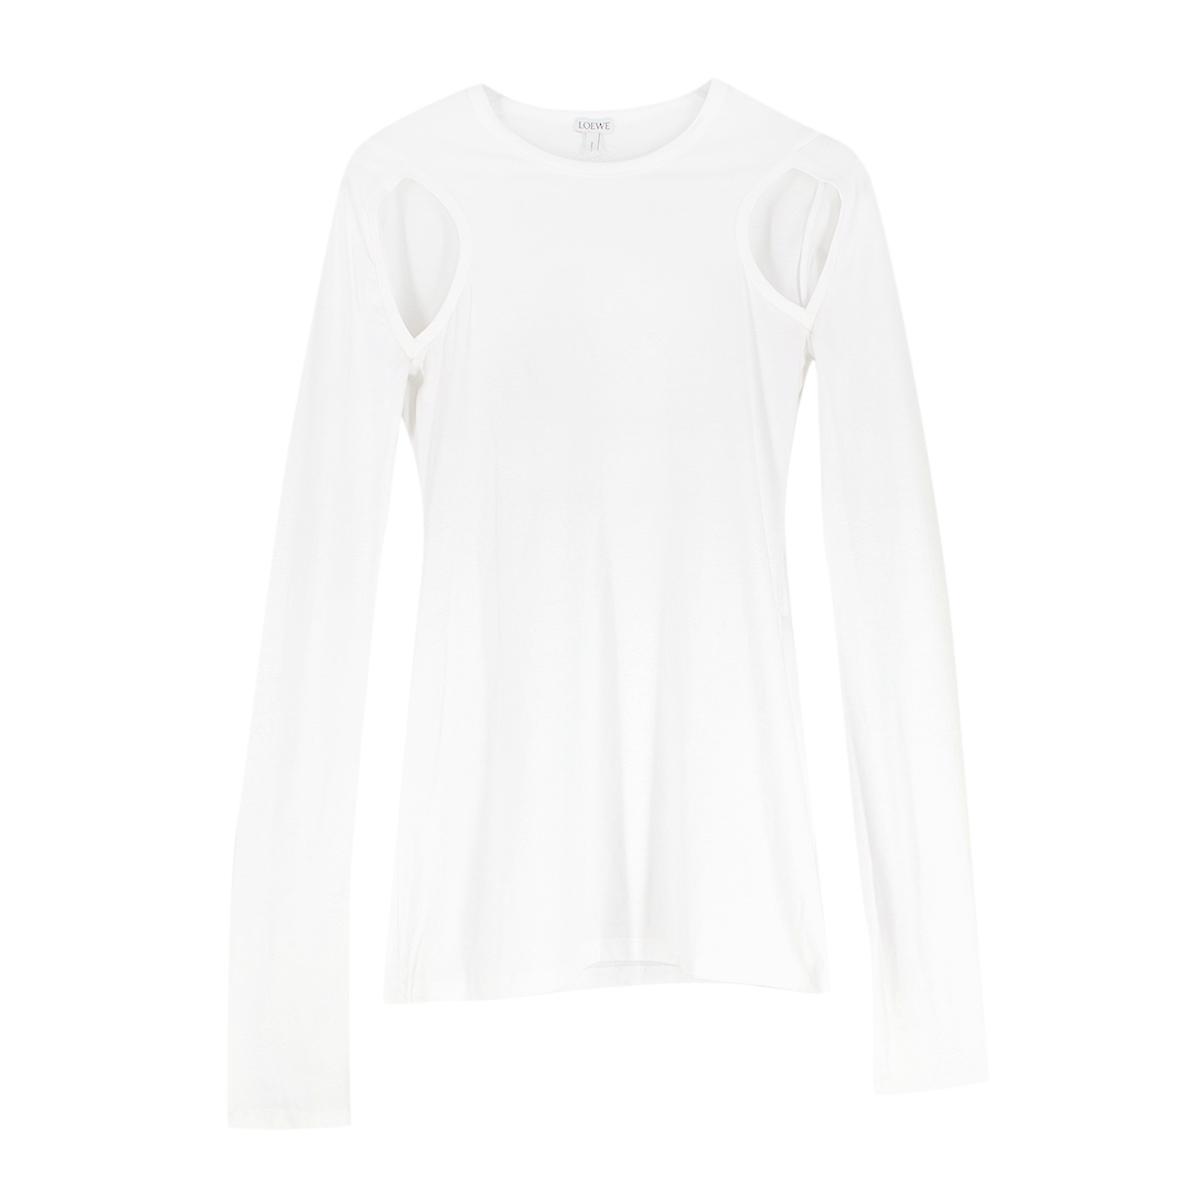 Loewe White Cut Out Long Sleeve T-Shirt